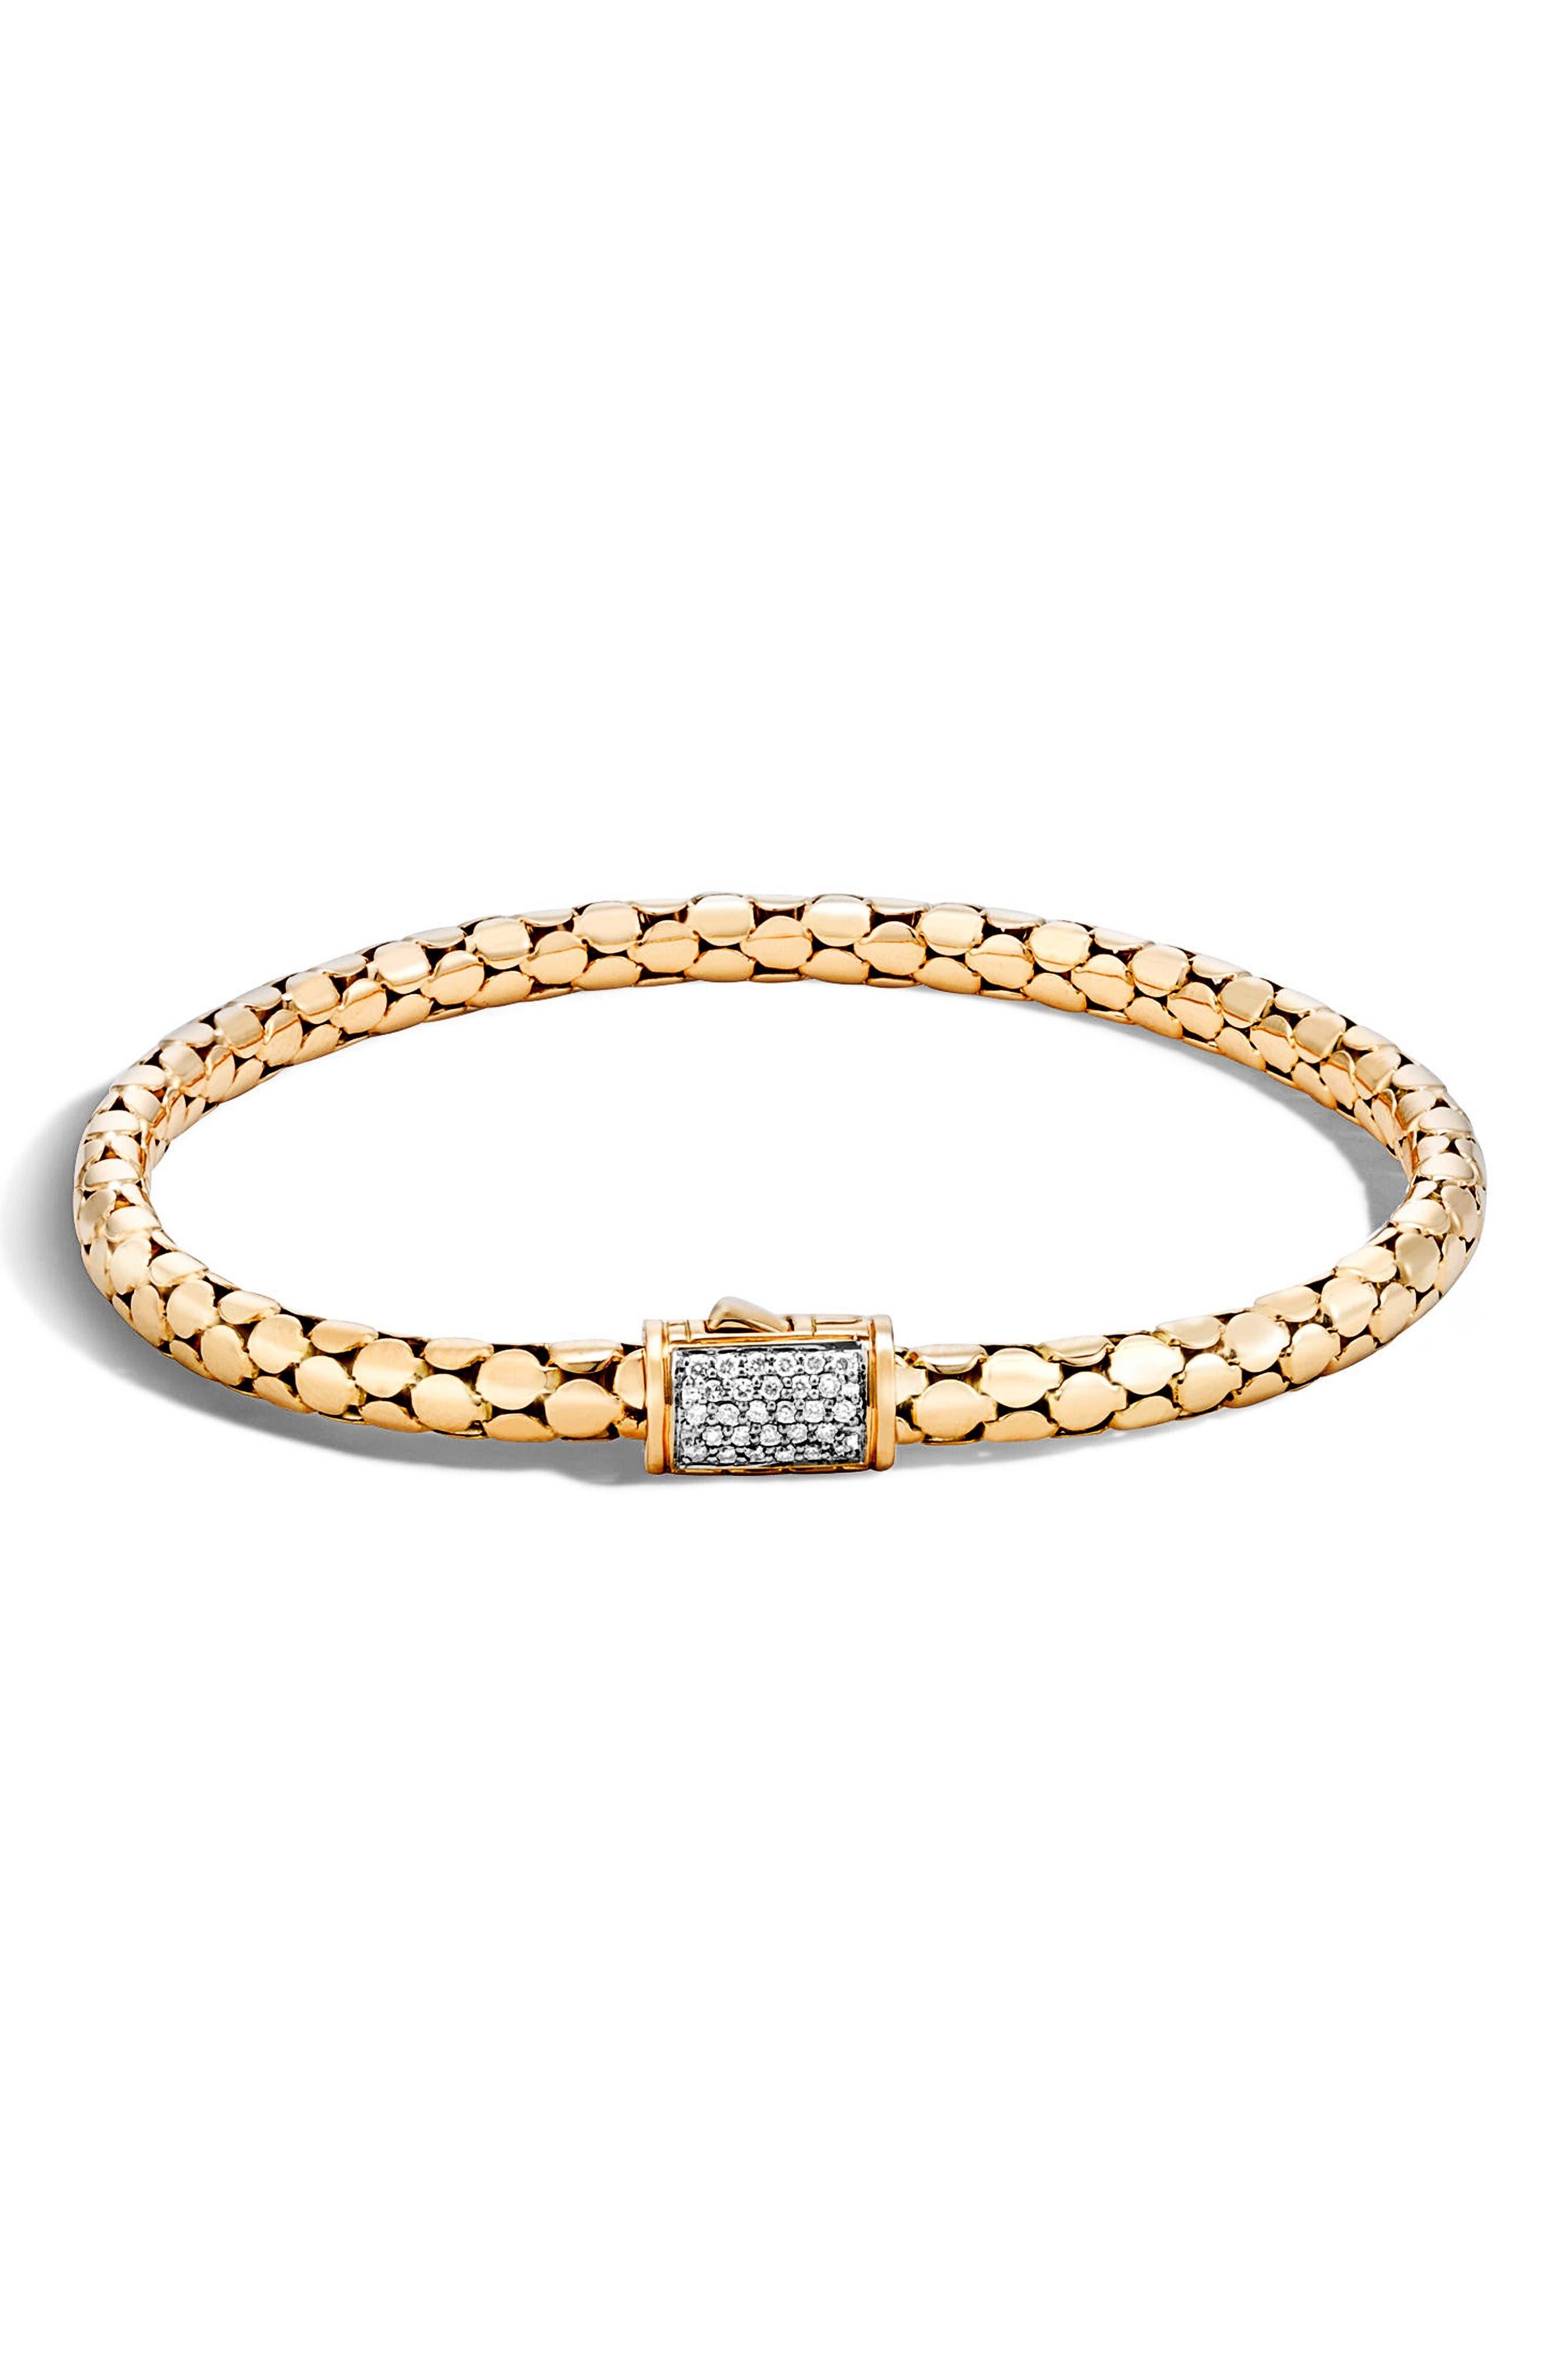 Main Image - John Hardy Dot Diamond Chain Bracelet